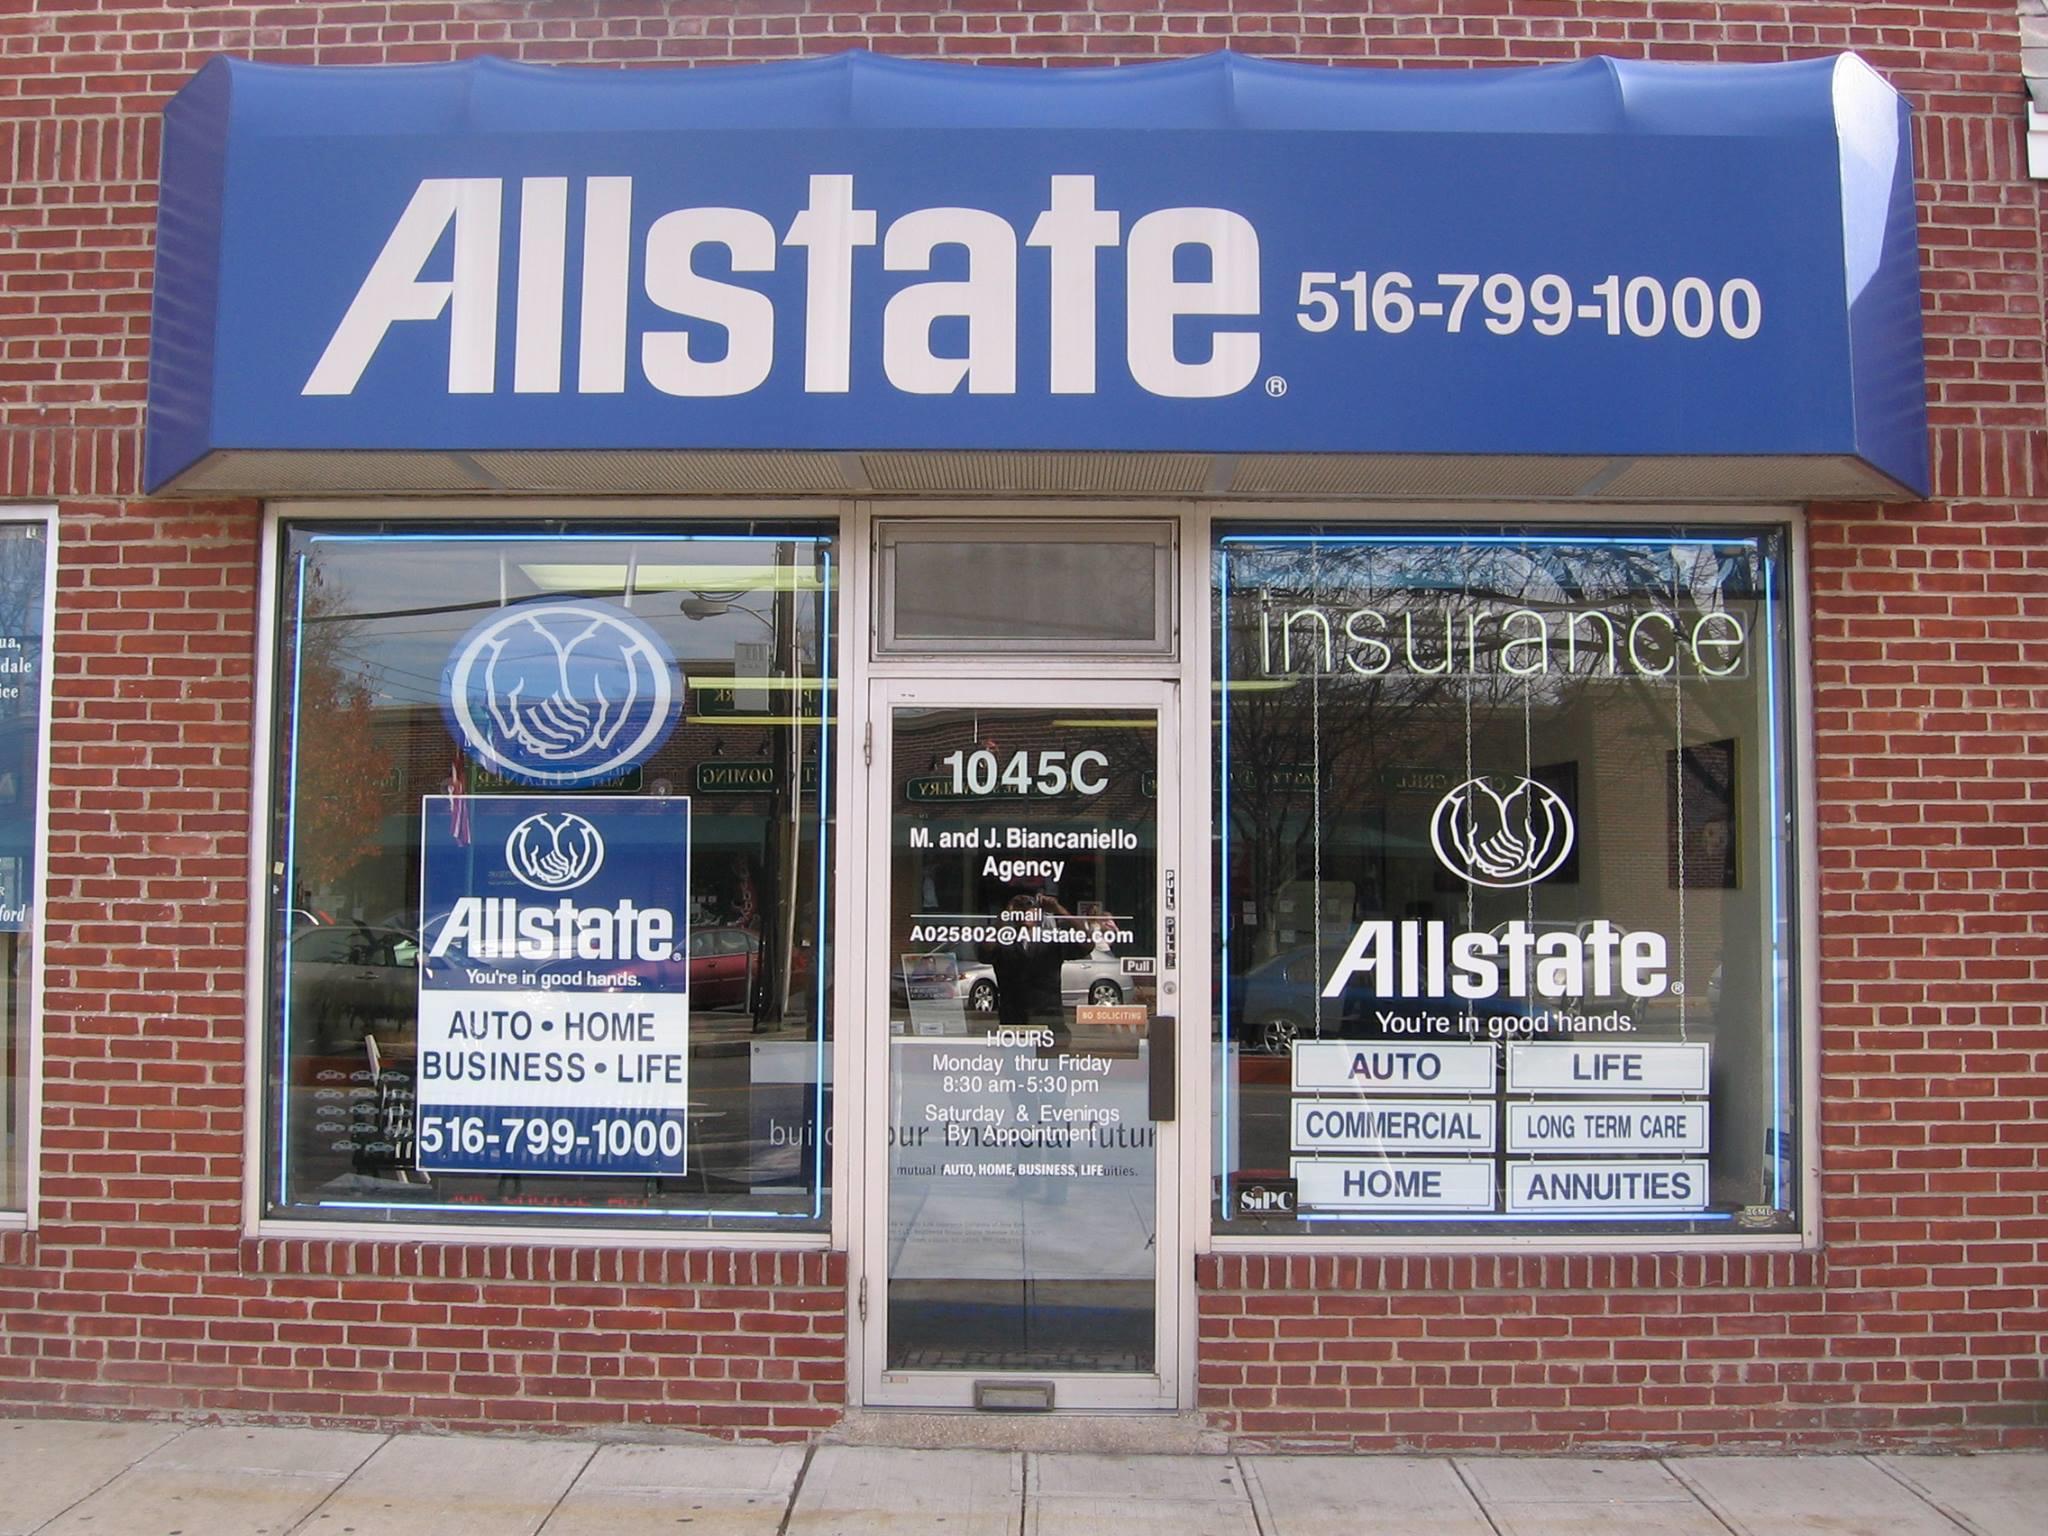 Mary Biancaniello: Allstate Insurance image 2